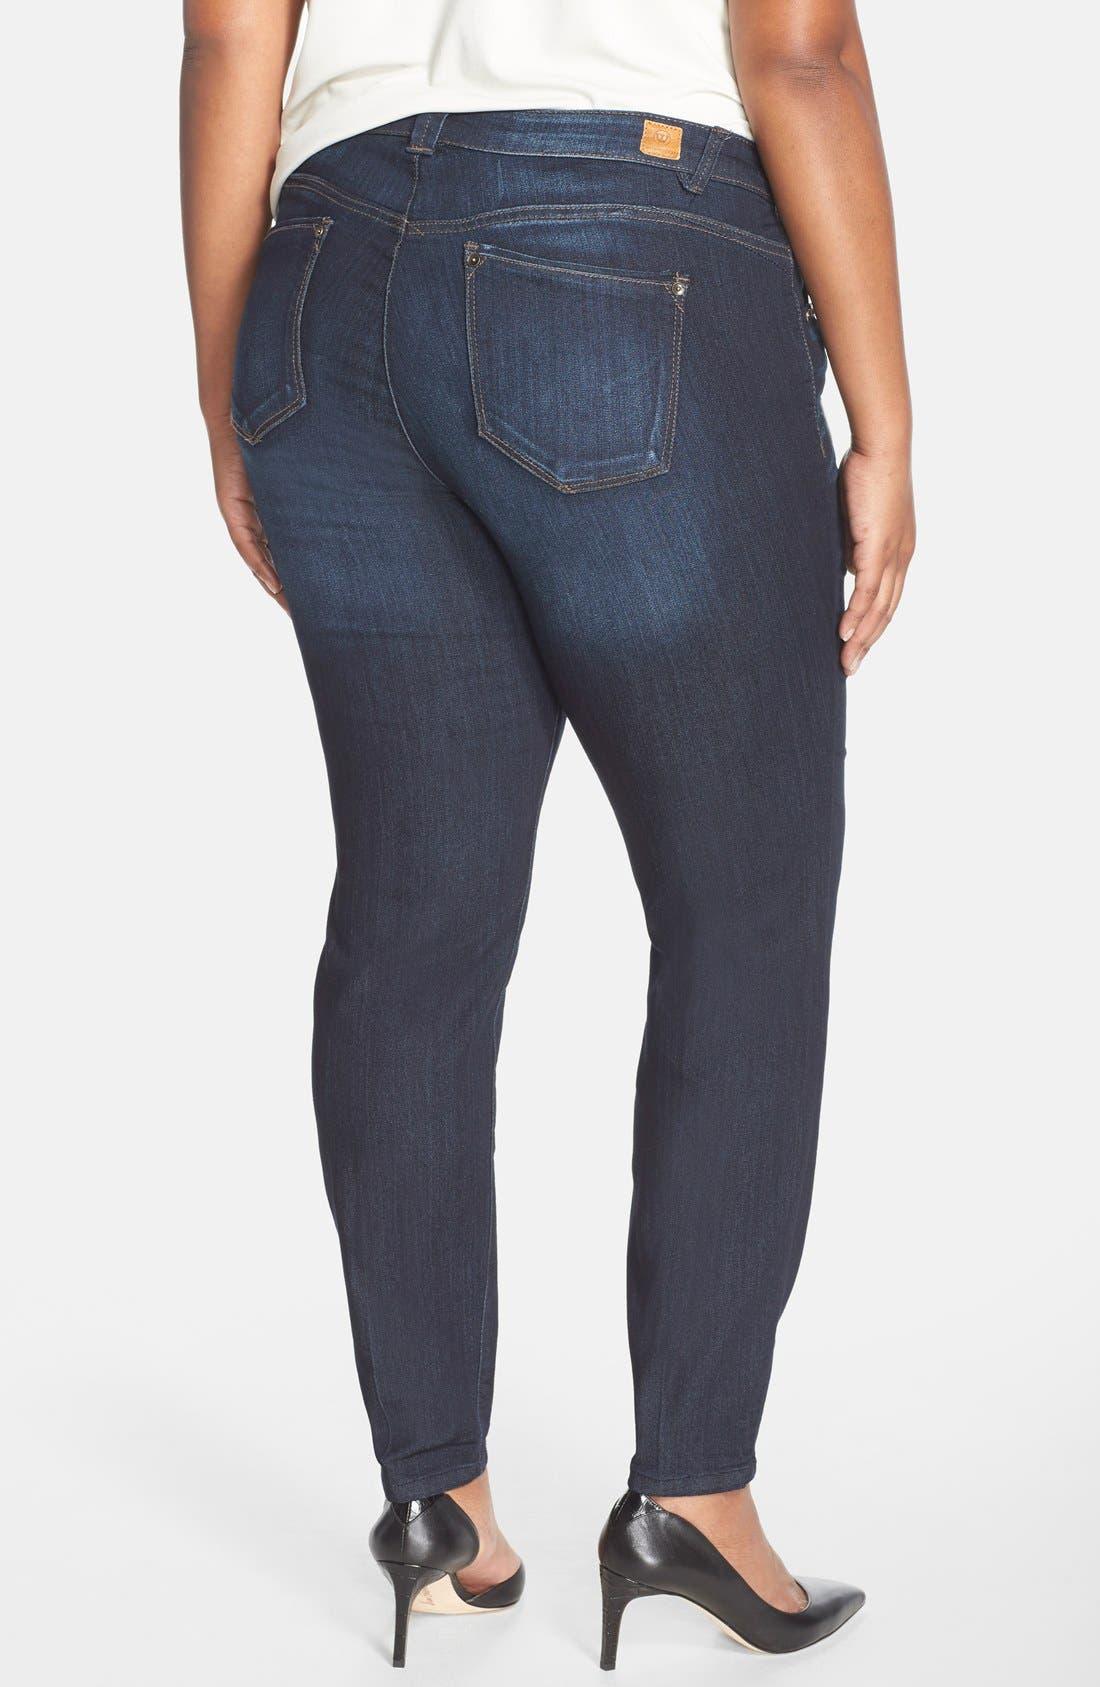 WIT & WISDOM, 'Super Smooth' Stretch Skinny Jeans, Alternate thumbnail 5, color, DARK NAVY